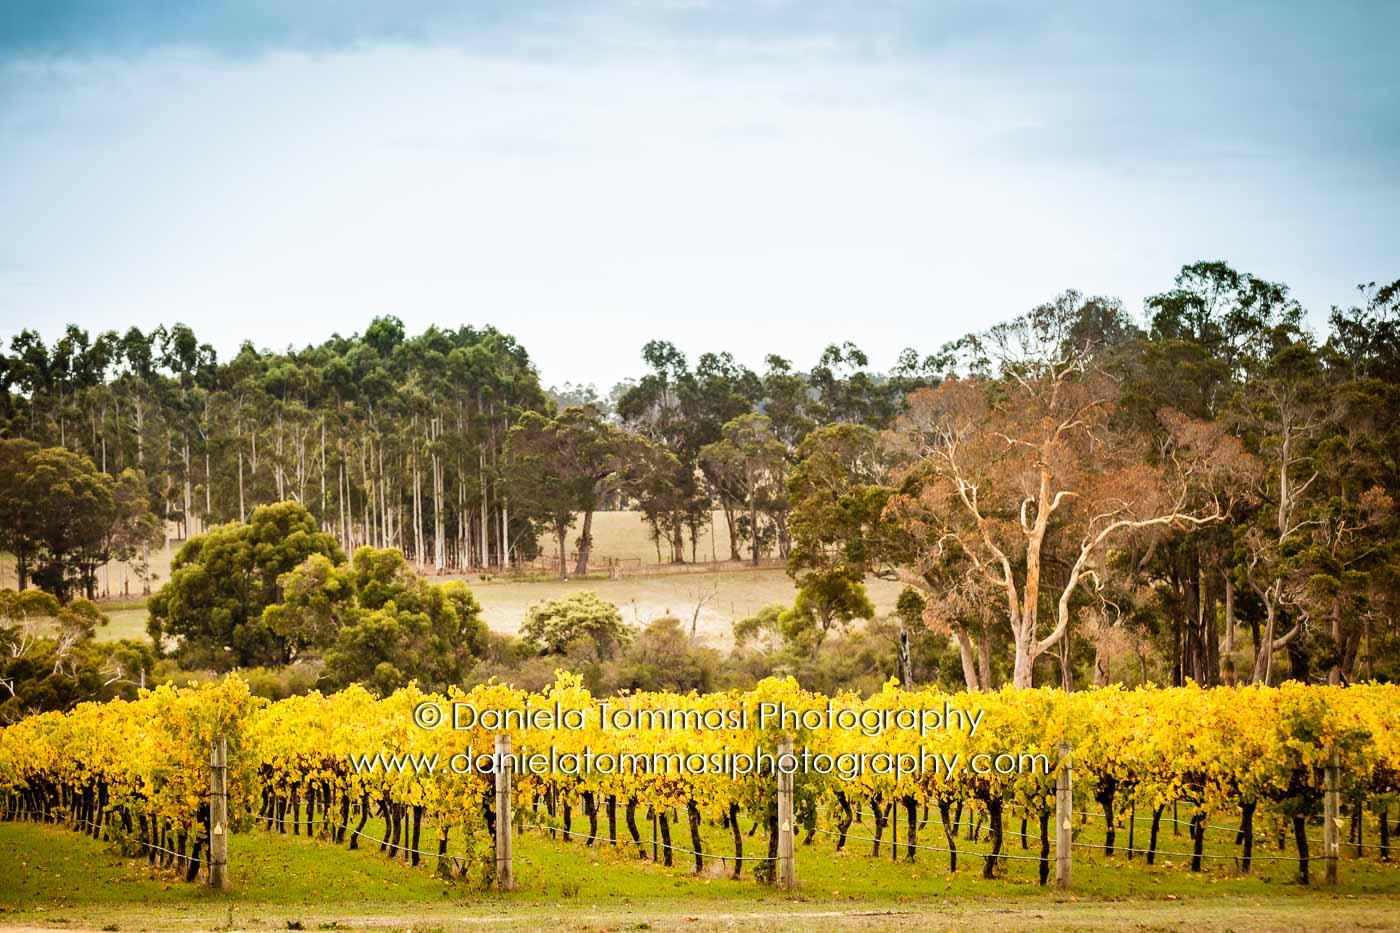 Winery-Daniela Tommasi Photography-11